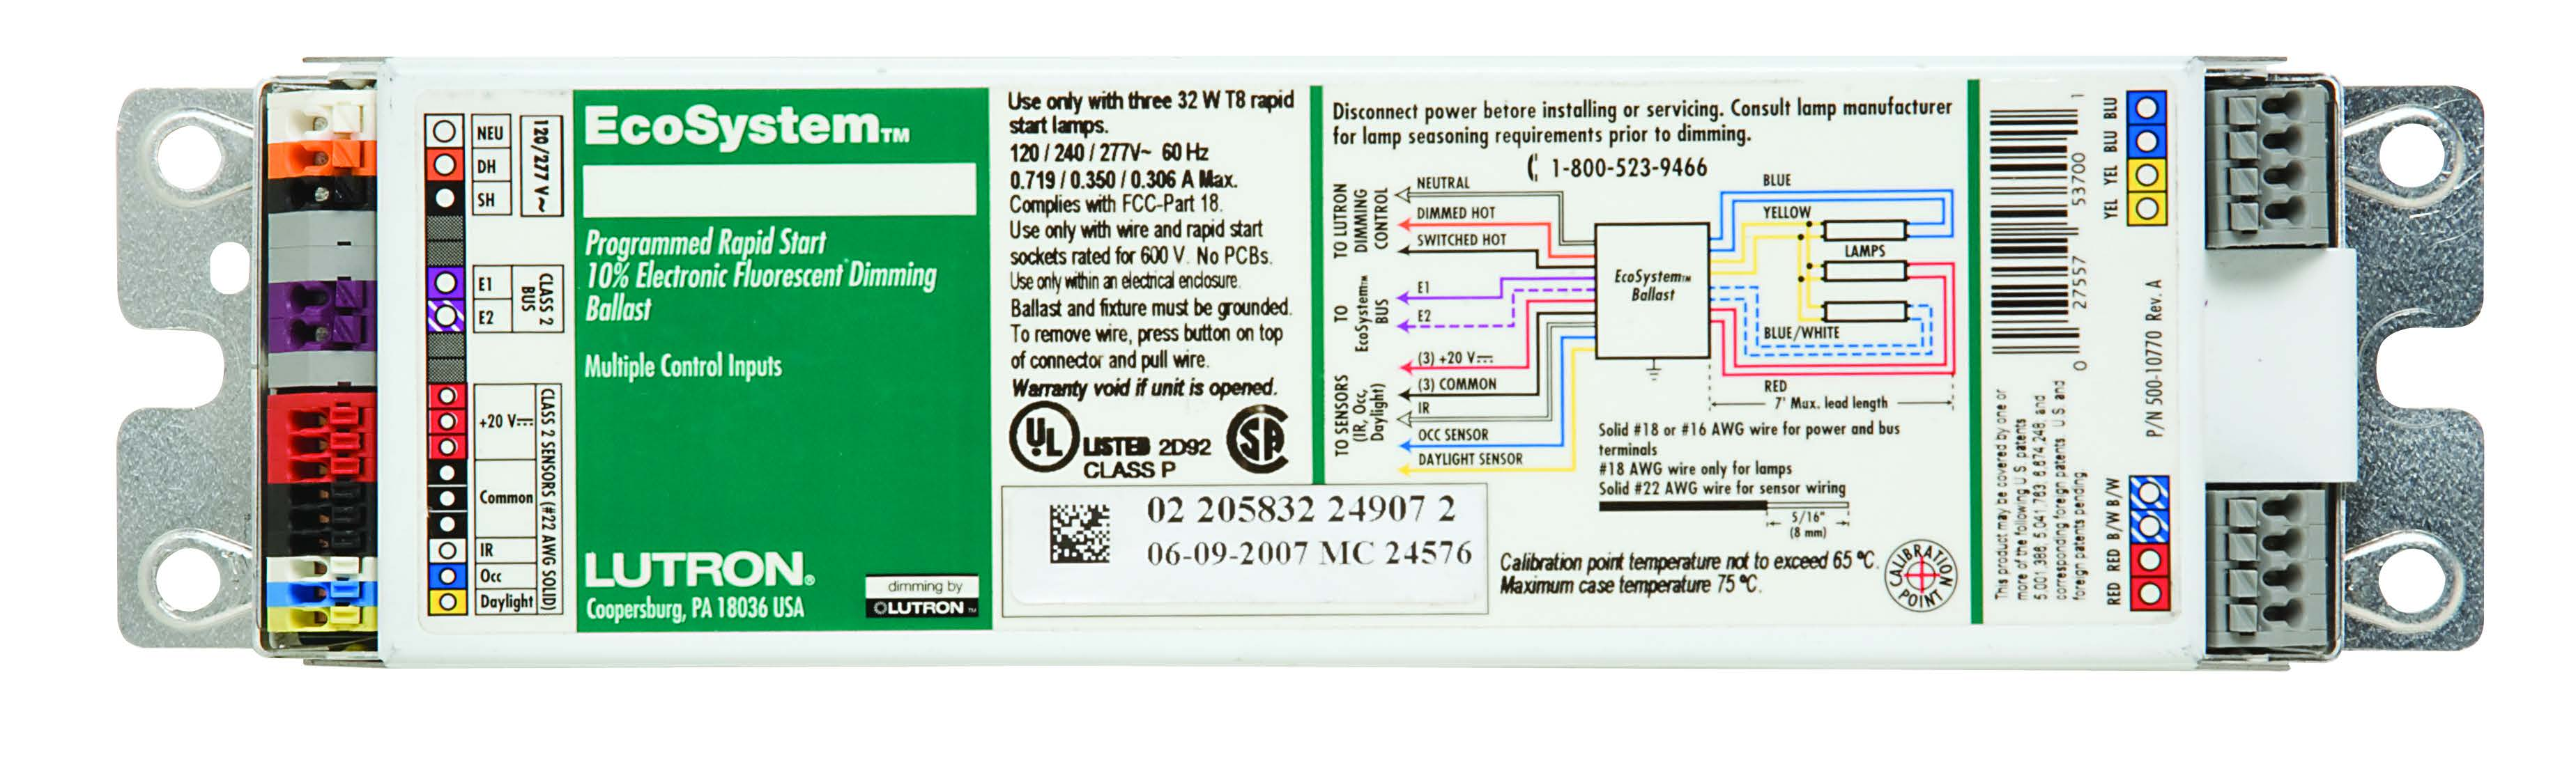 EC5T832GUNV3L Lutron Ecosystem Ballast 5 Input T8 32W Gunv 3 LampElliott Electric Supply